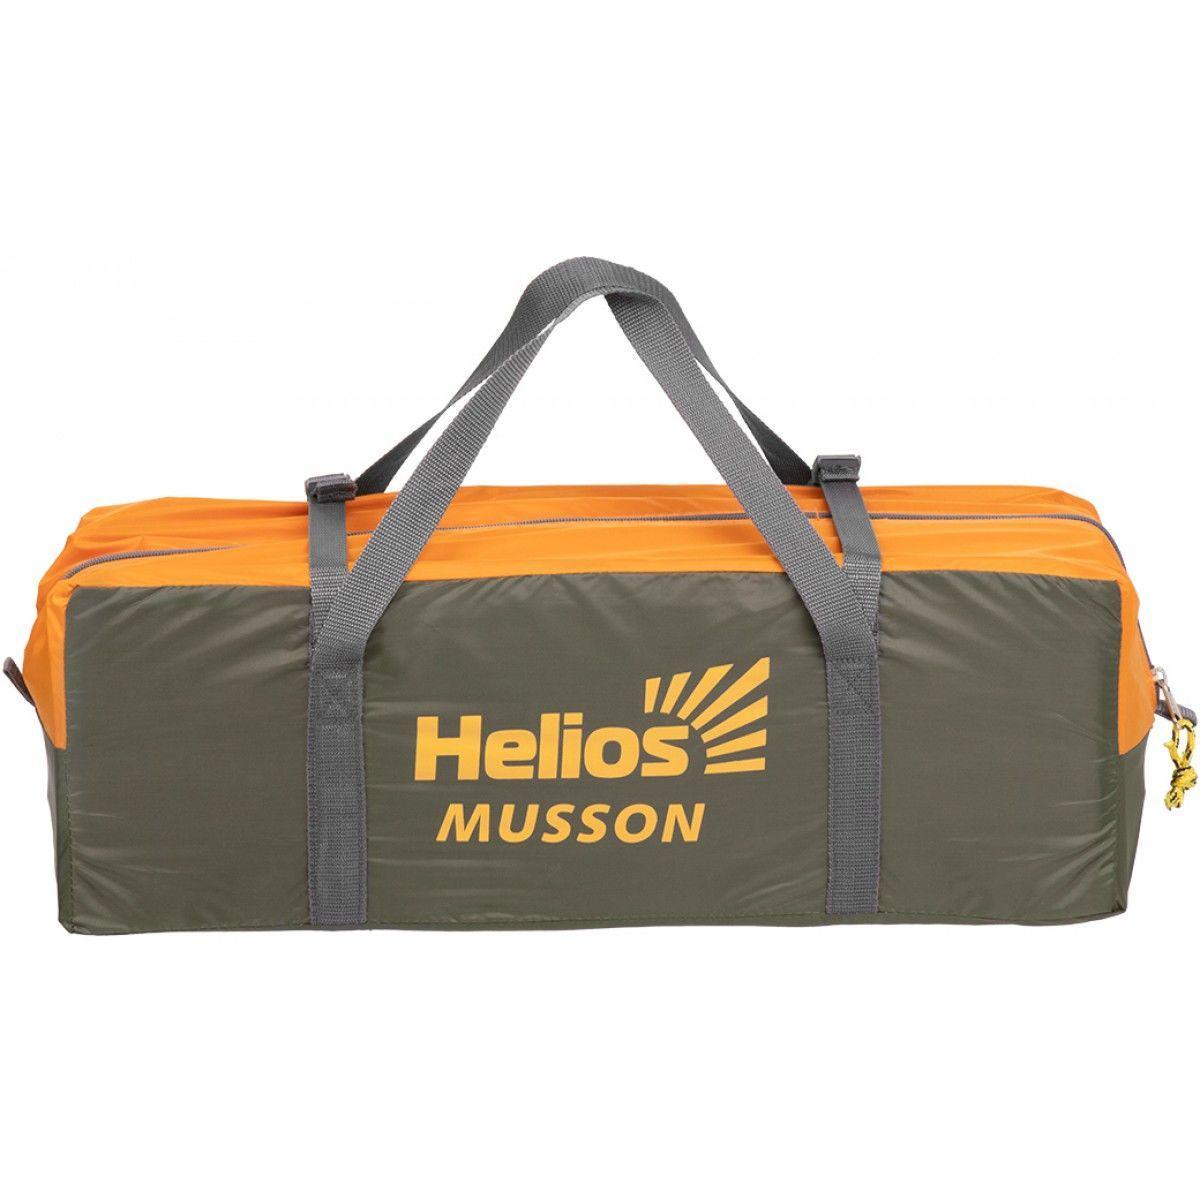 Палатка MUSSON-4 Helios зеленый-оранжевый HS-2366-4 GO - фото 9